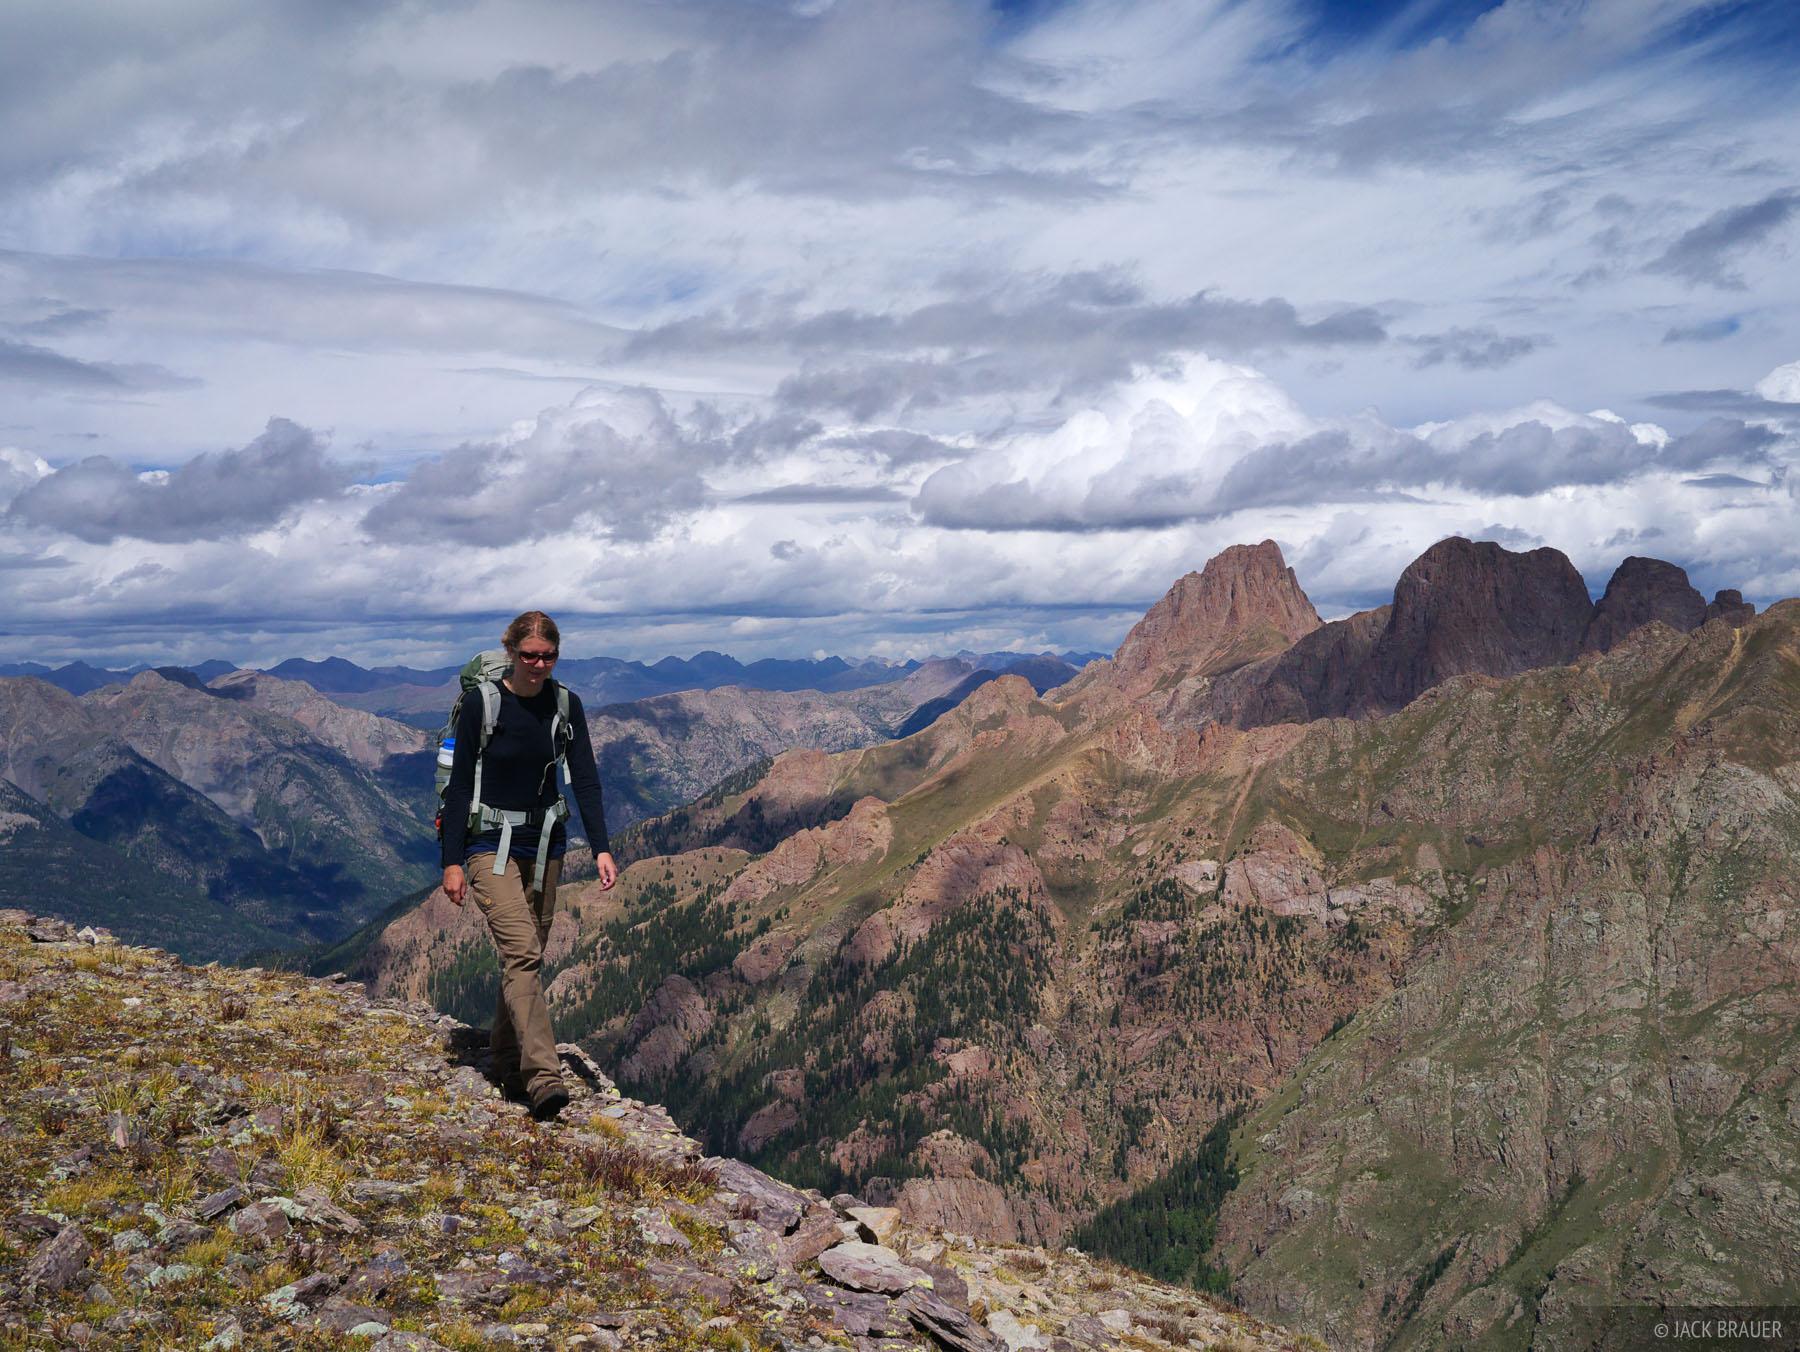 Pigeon Peak, Weminuche Wilderness, San Juan Mountains, Colorado, hiking, photo